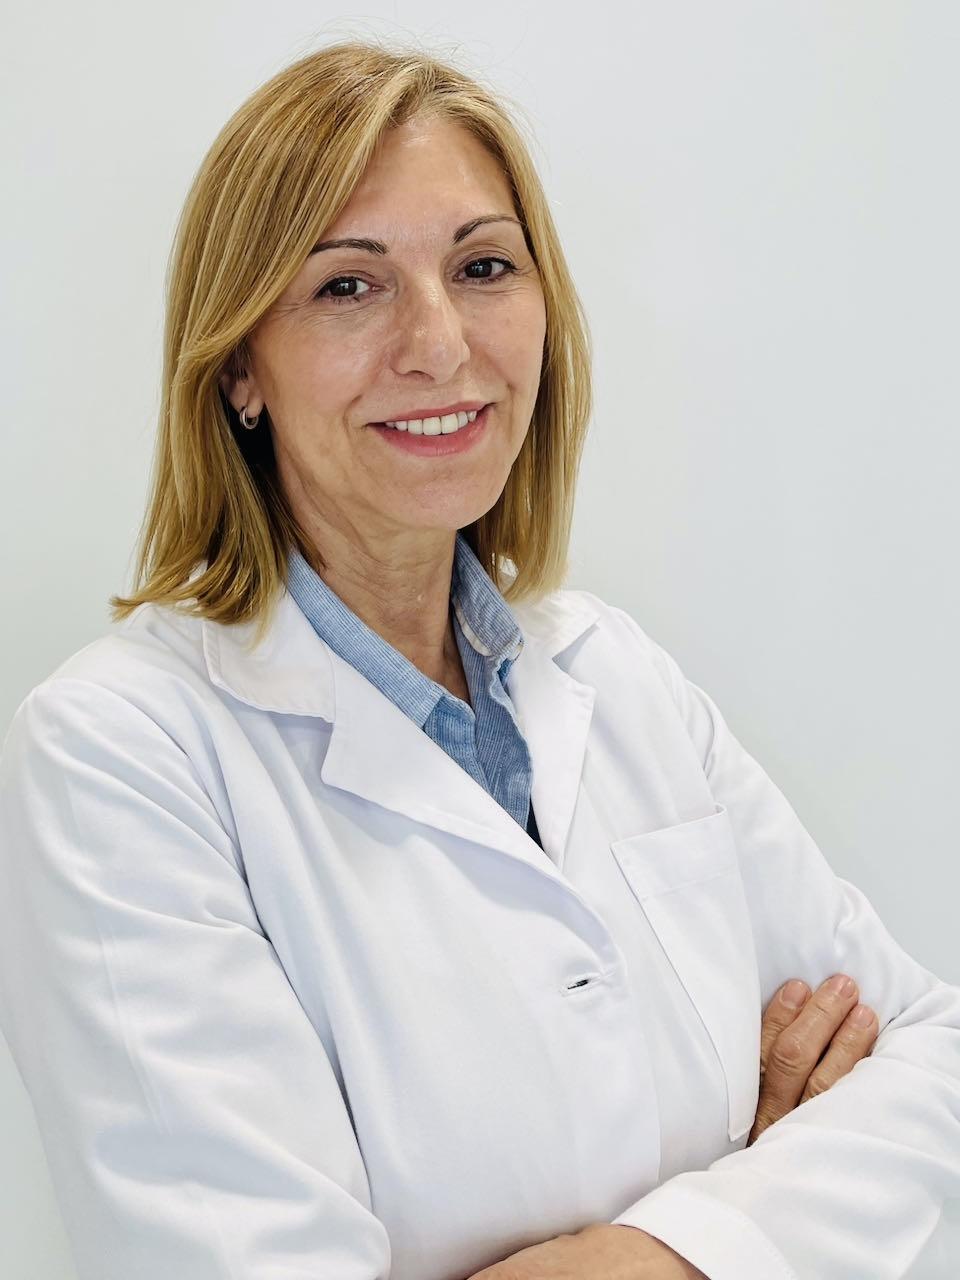 Dra. Marta Pons Mañosa